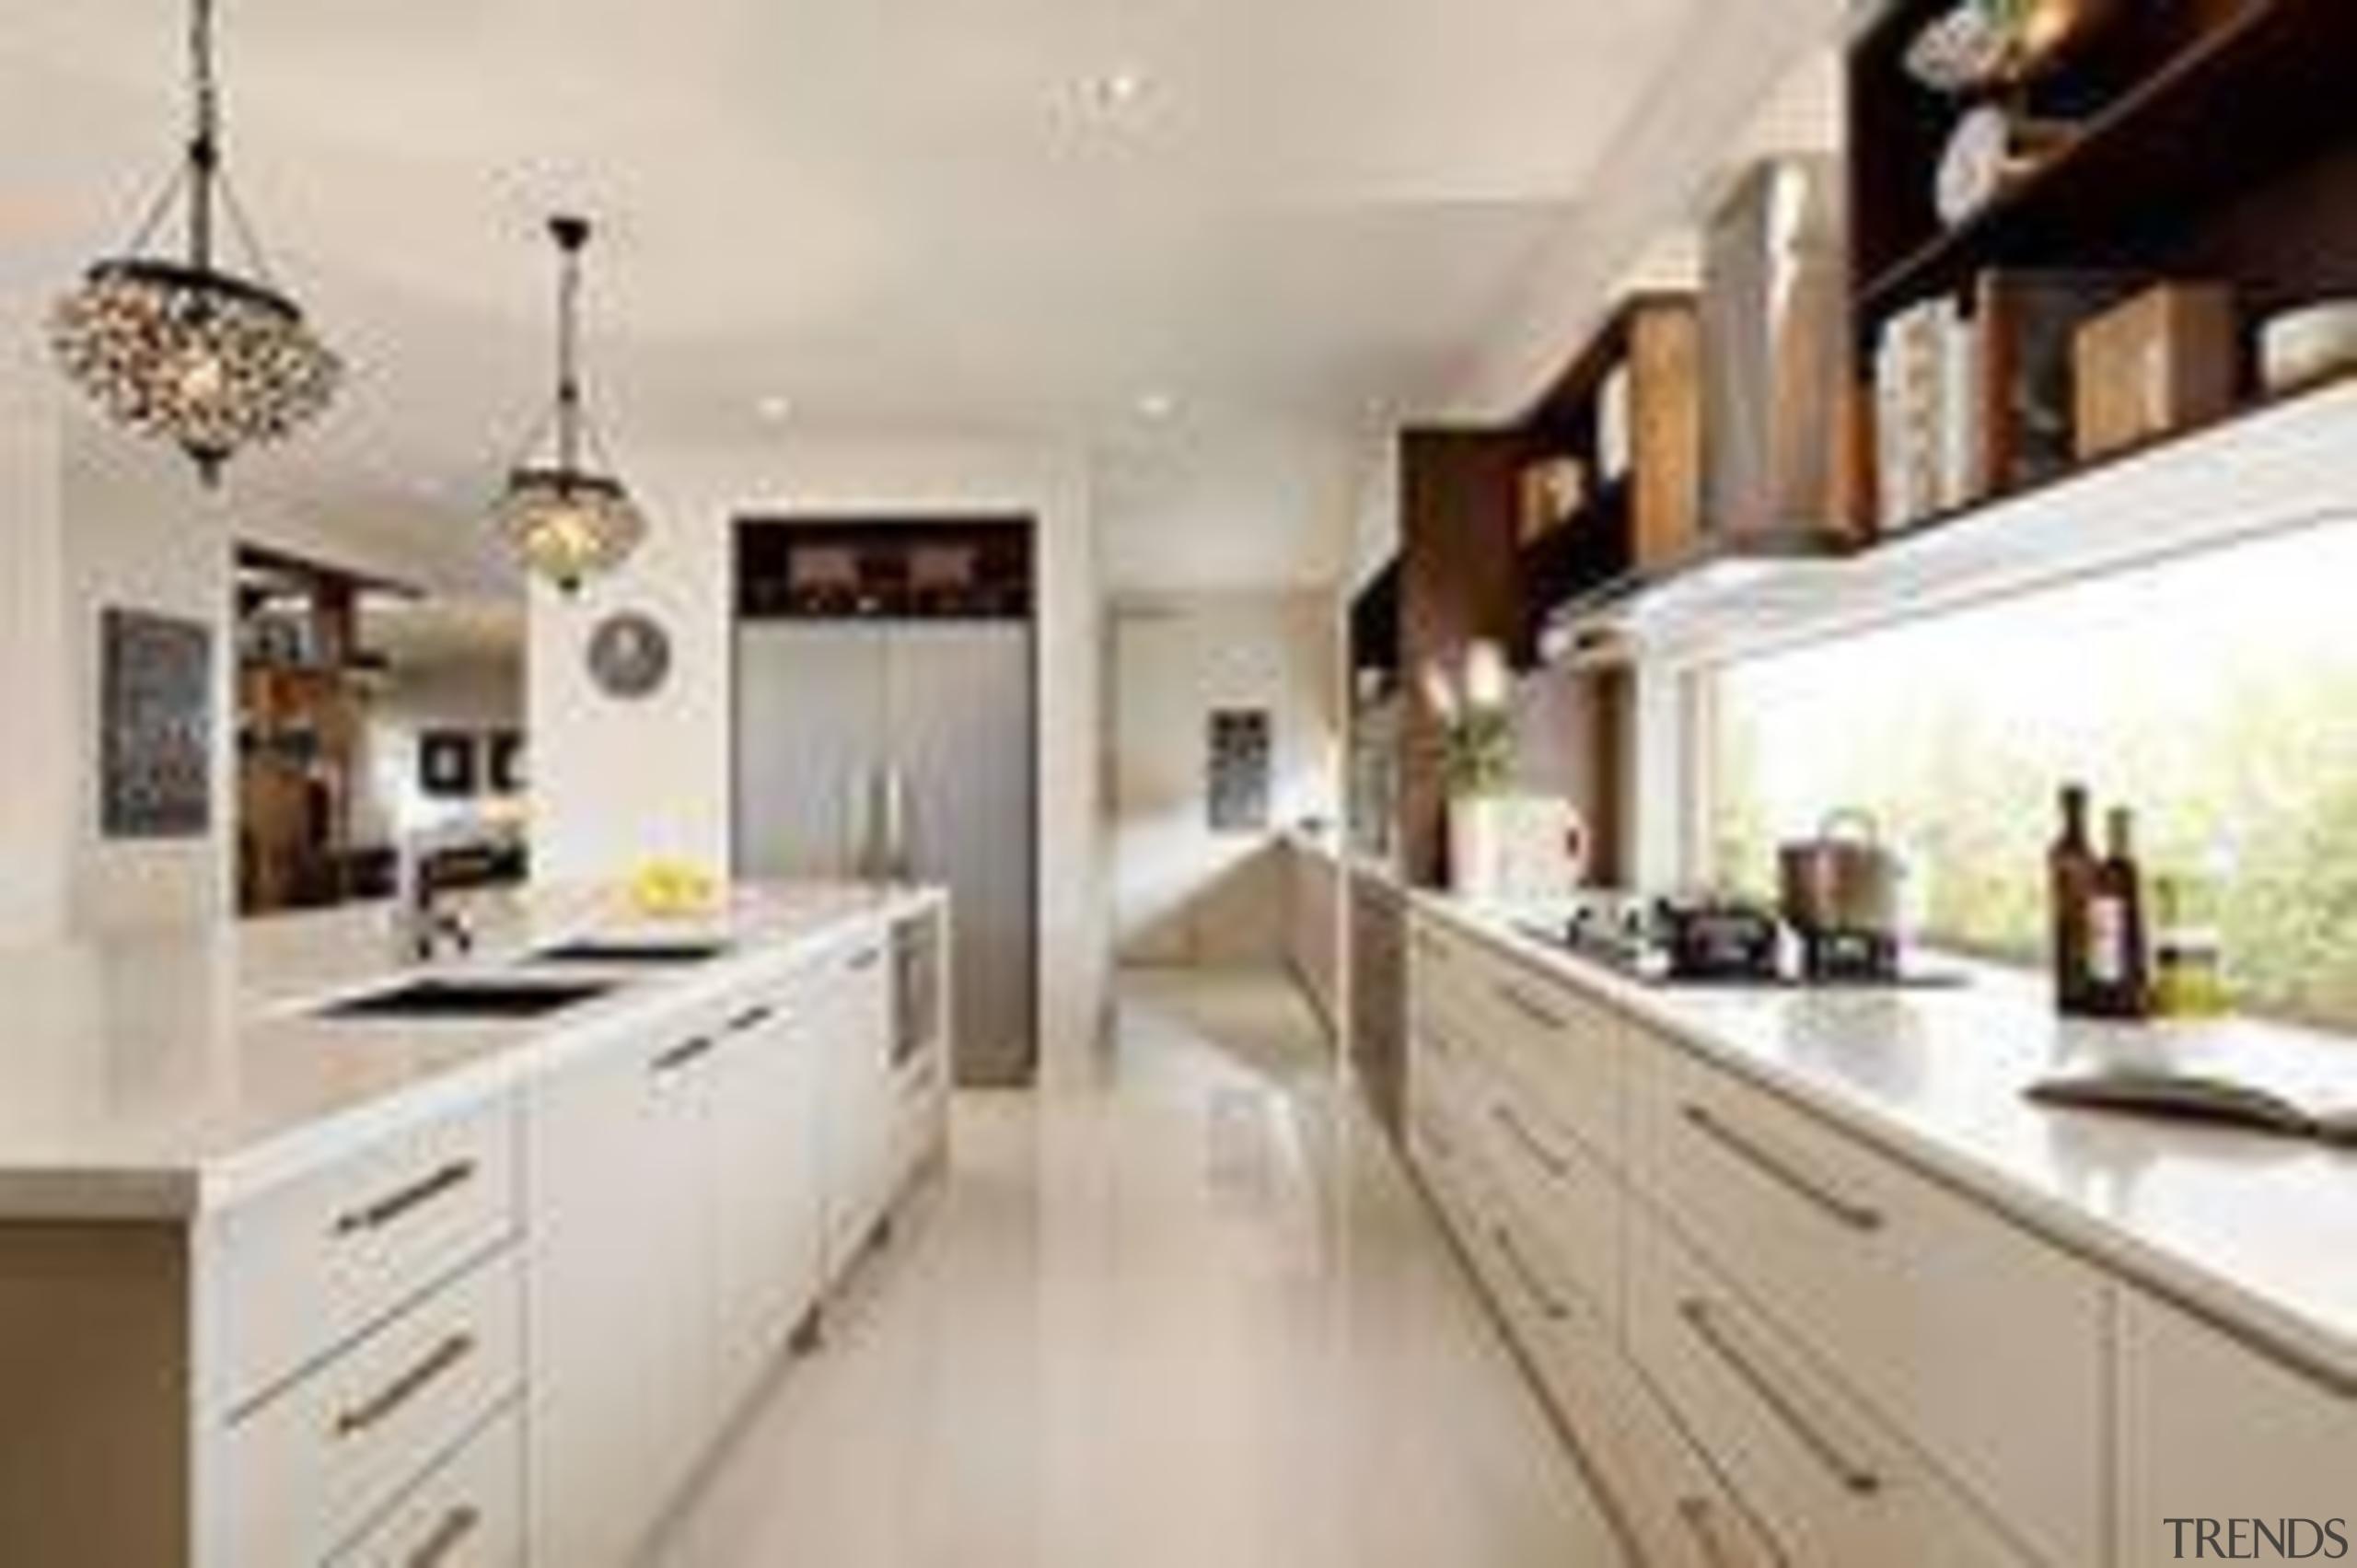 Carlisle Homes Nimbus - Nimbus™ - countertop | countertop, cuisine classique, interior design, kitchen, property, real estate, room, gray